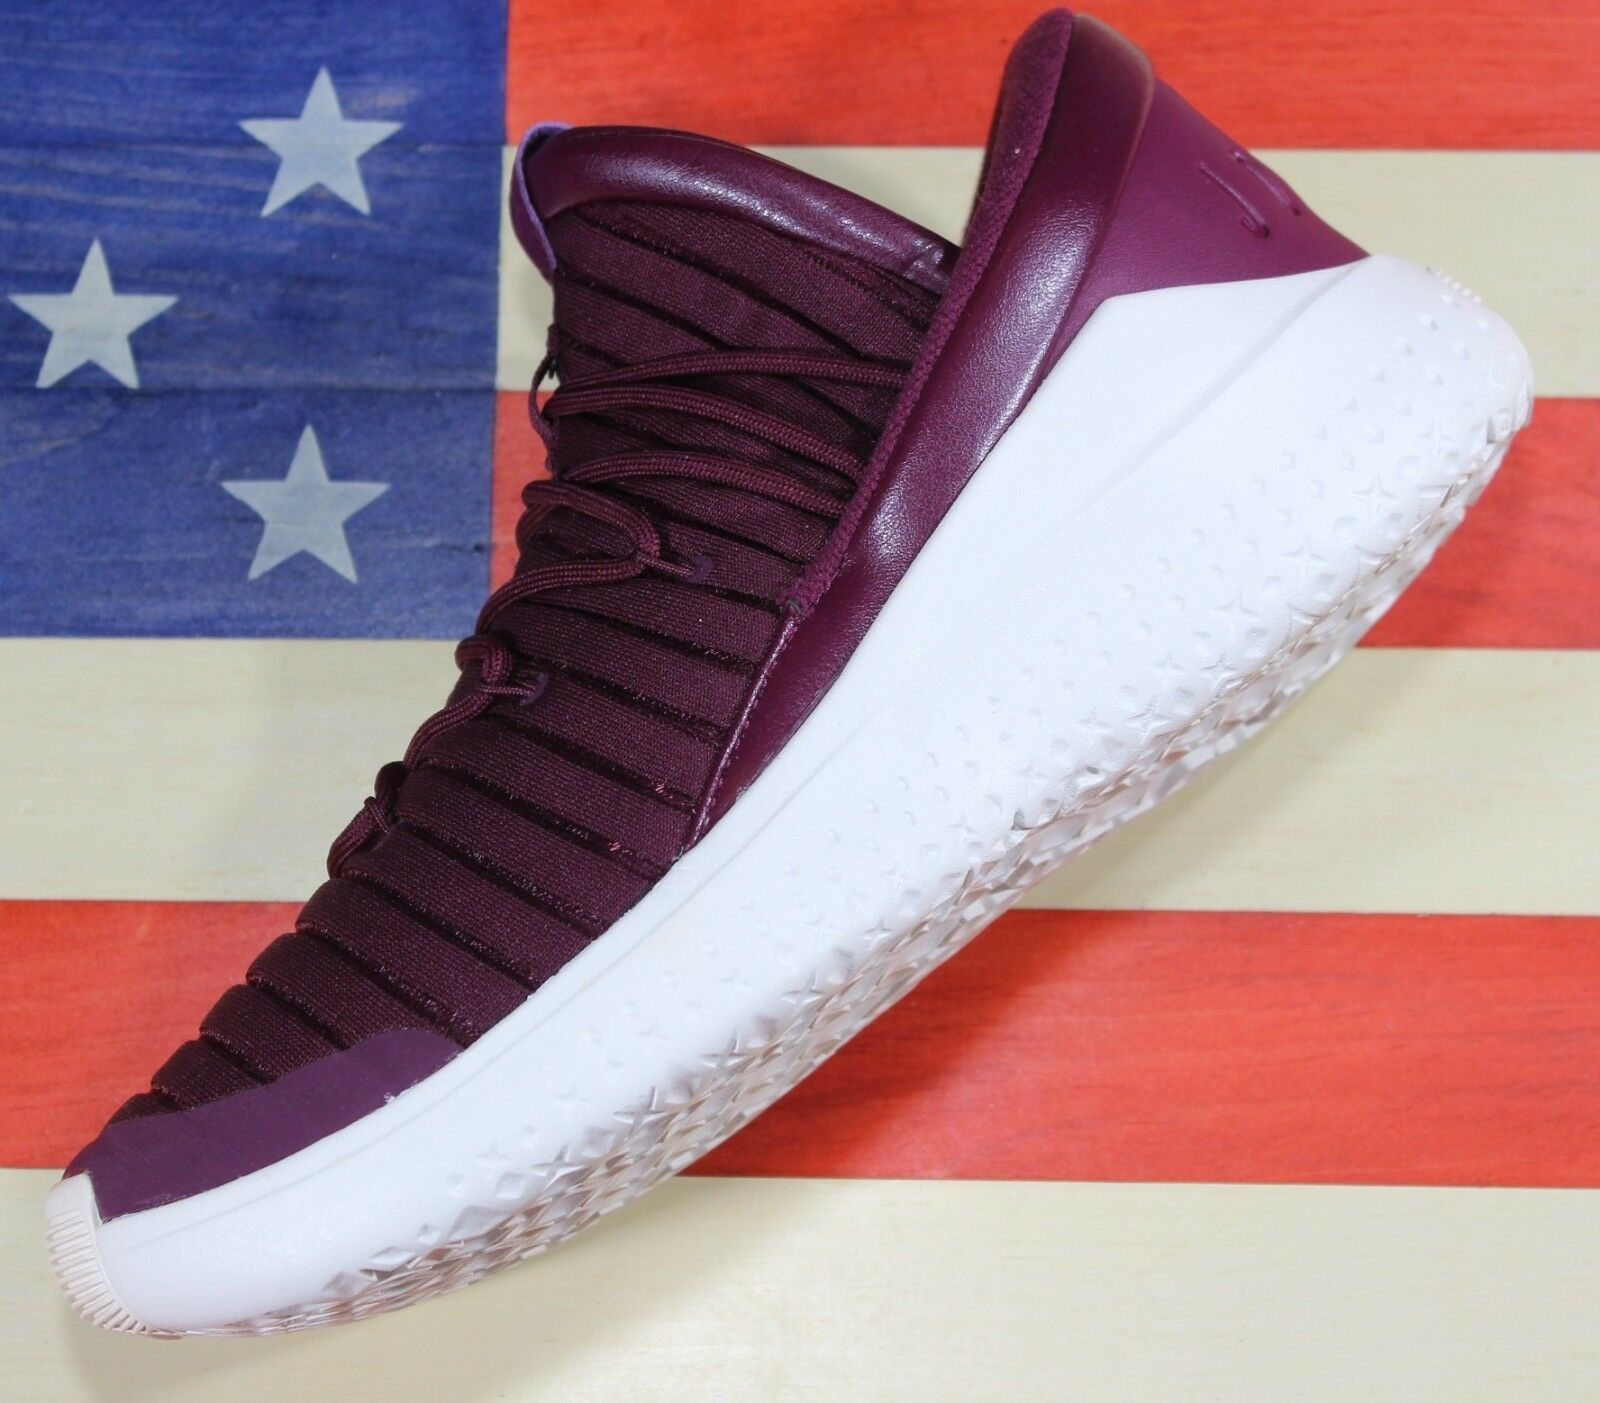 Nike Air Jordan Flight Luxe Retro Bordeaux-Sail White Training shoes [919715-637]